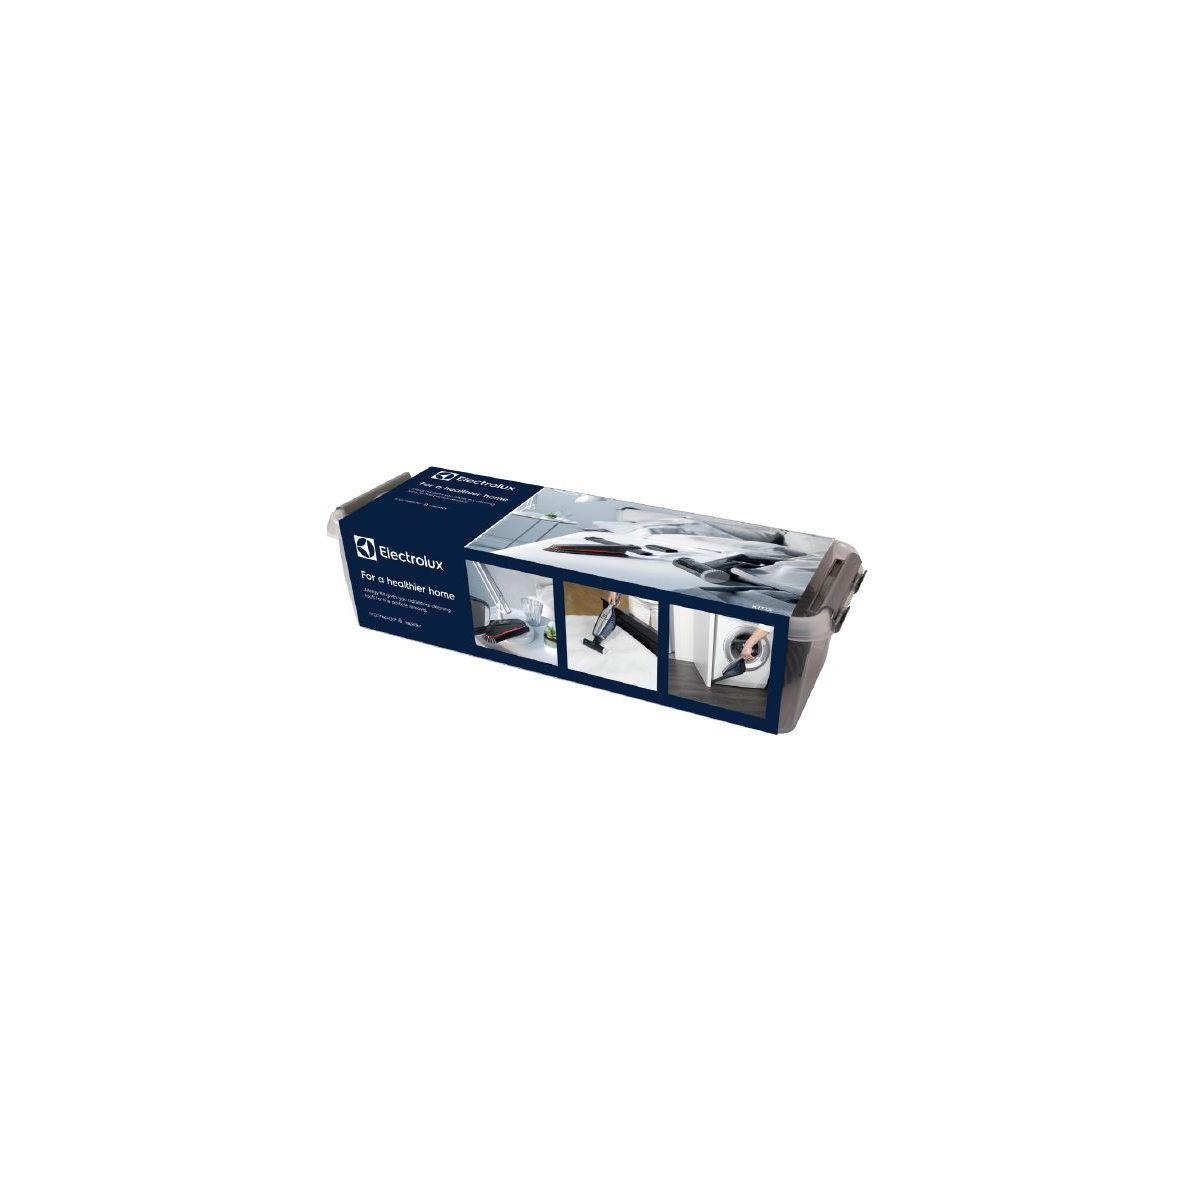 Kit de nettoyage ELECTROLUX Kit 15 brosse +suceur+ adapt rapido